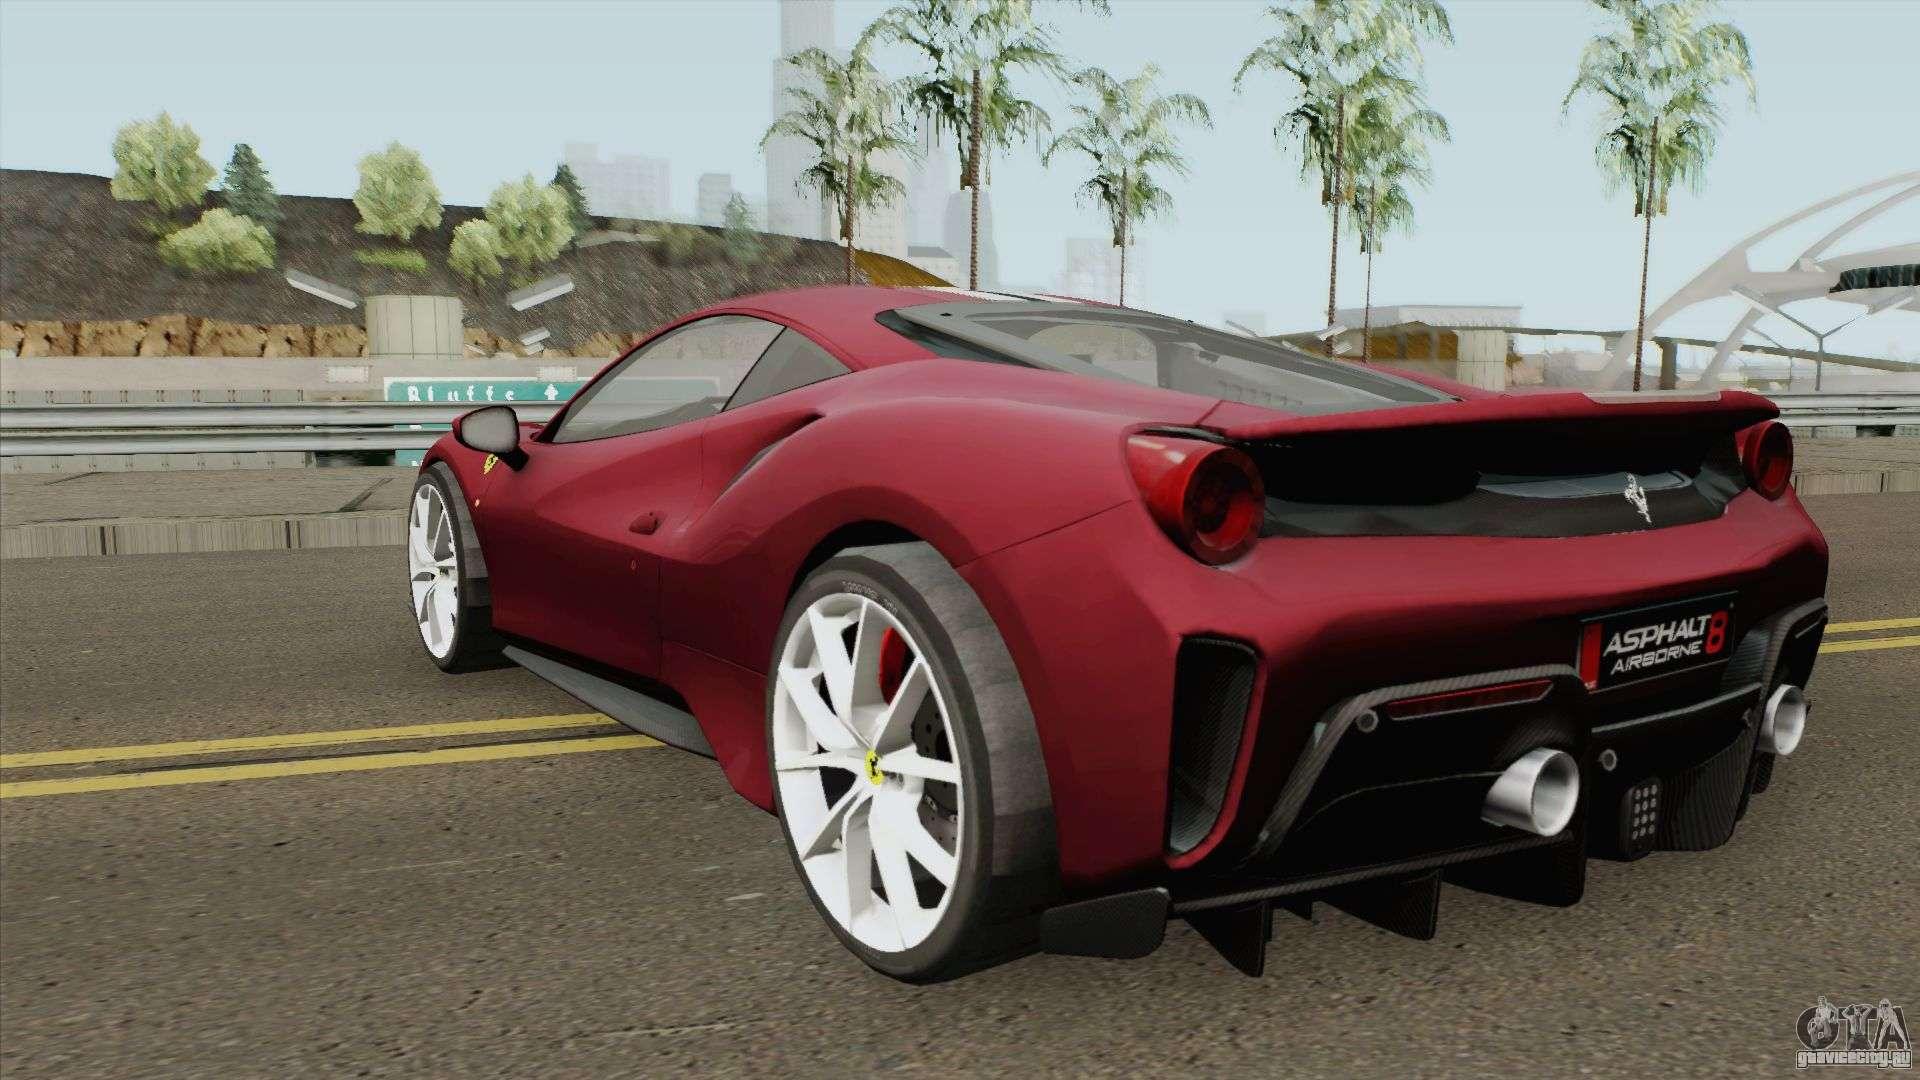 Ferrari 488 Pista 2019 High Quality для Gta San Andreas